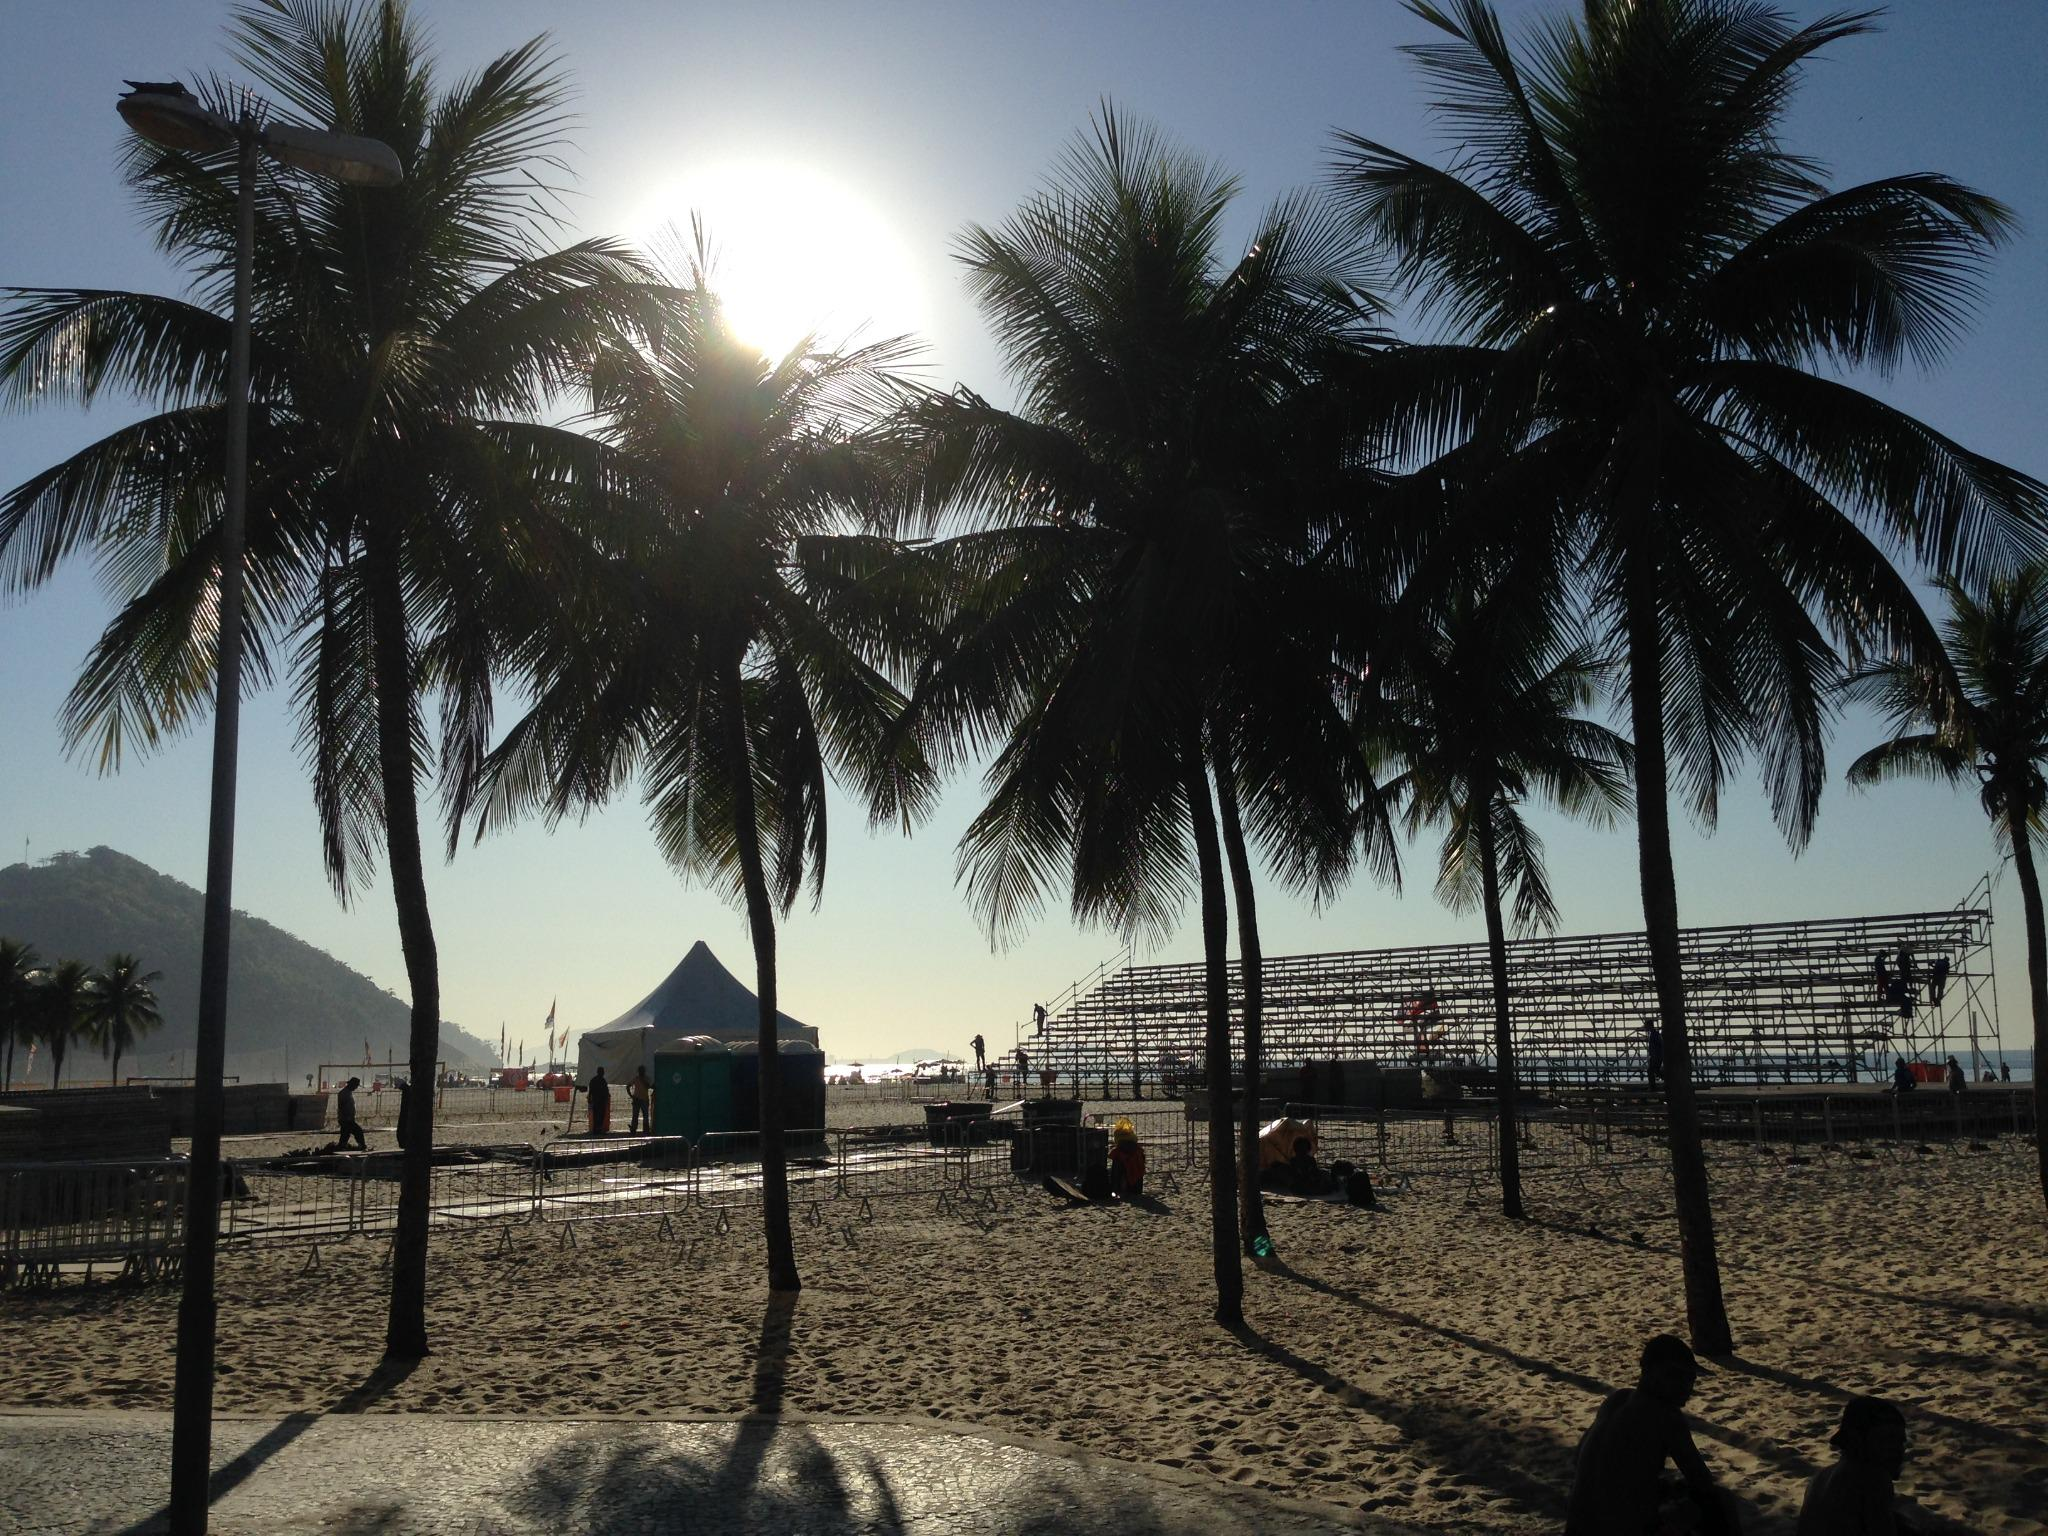 We're headed to Copacabana Beach next week with the top @USAVBeach names to face Brazil! Follow the journey #USAvBRA http://t.co/yLpCuiUb8o